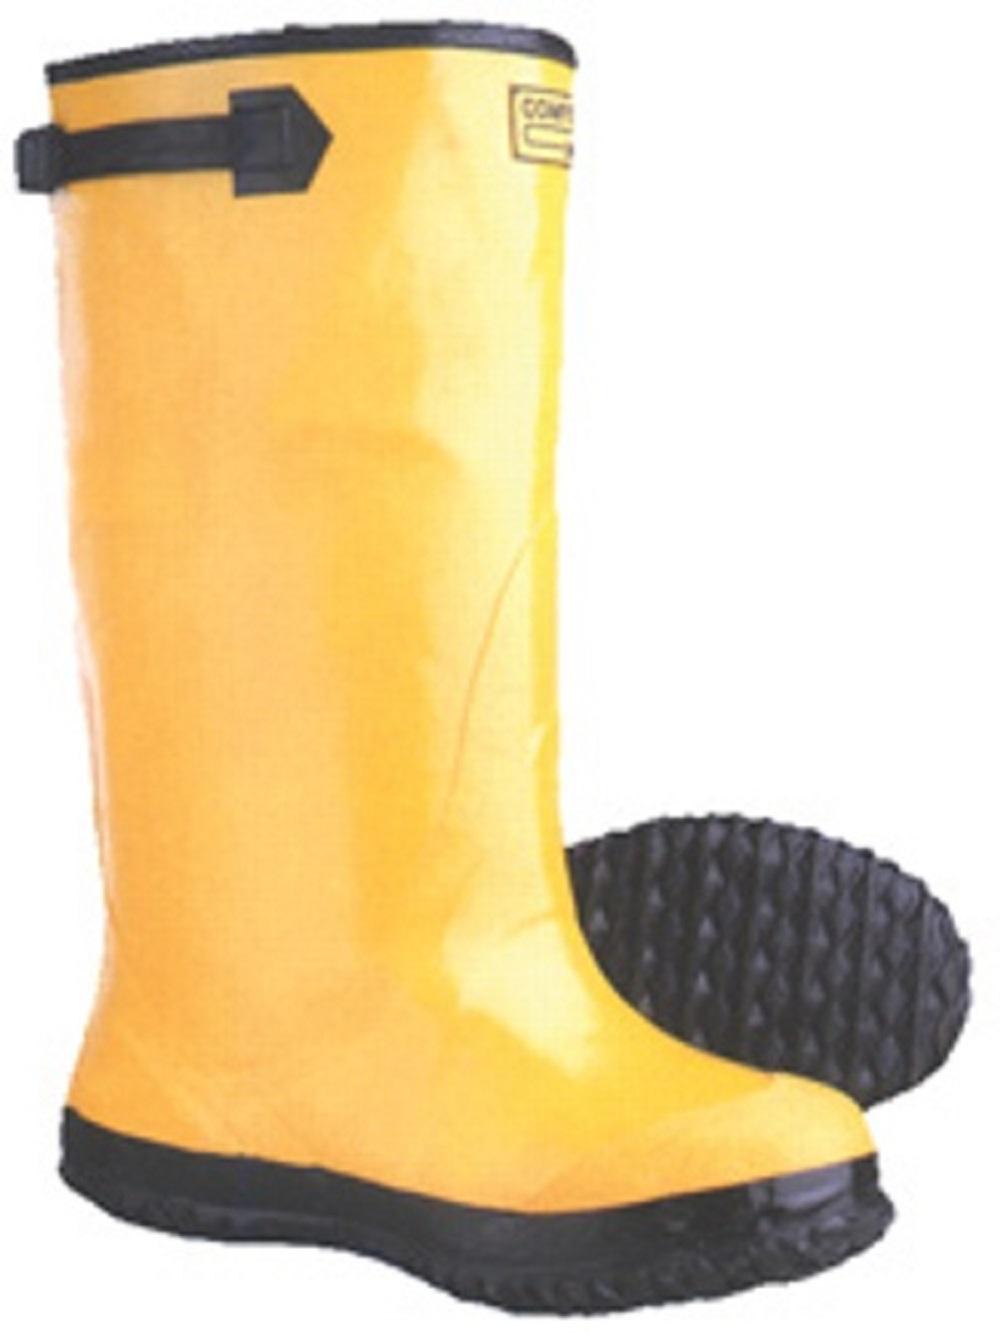 17'' Yellow Slush Boots, size 8 SLB-8